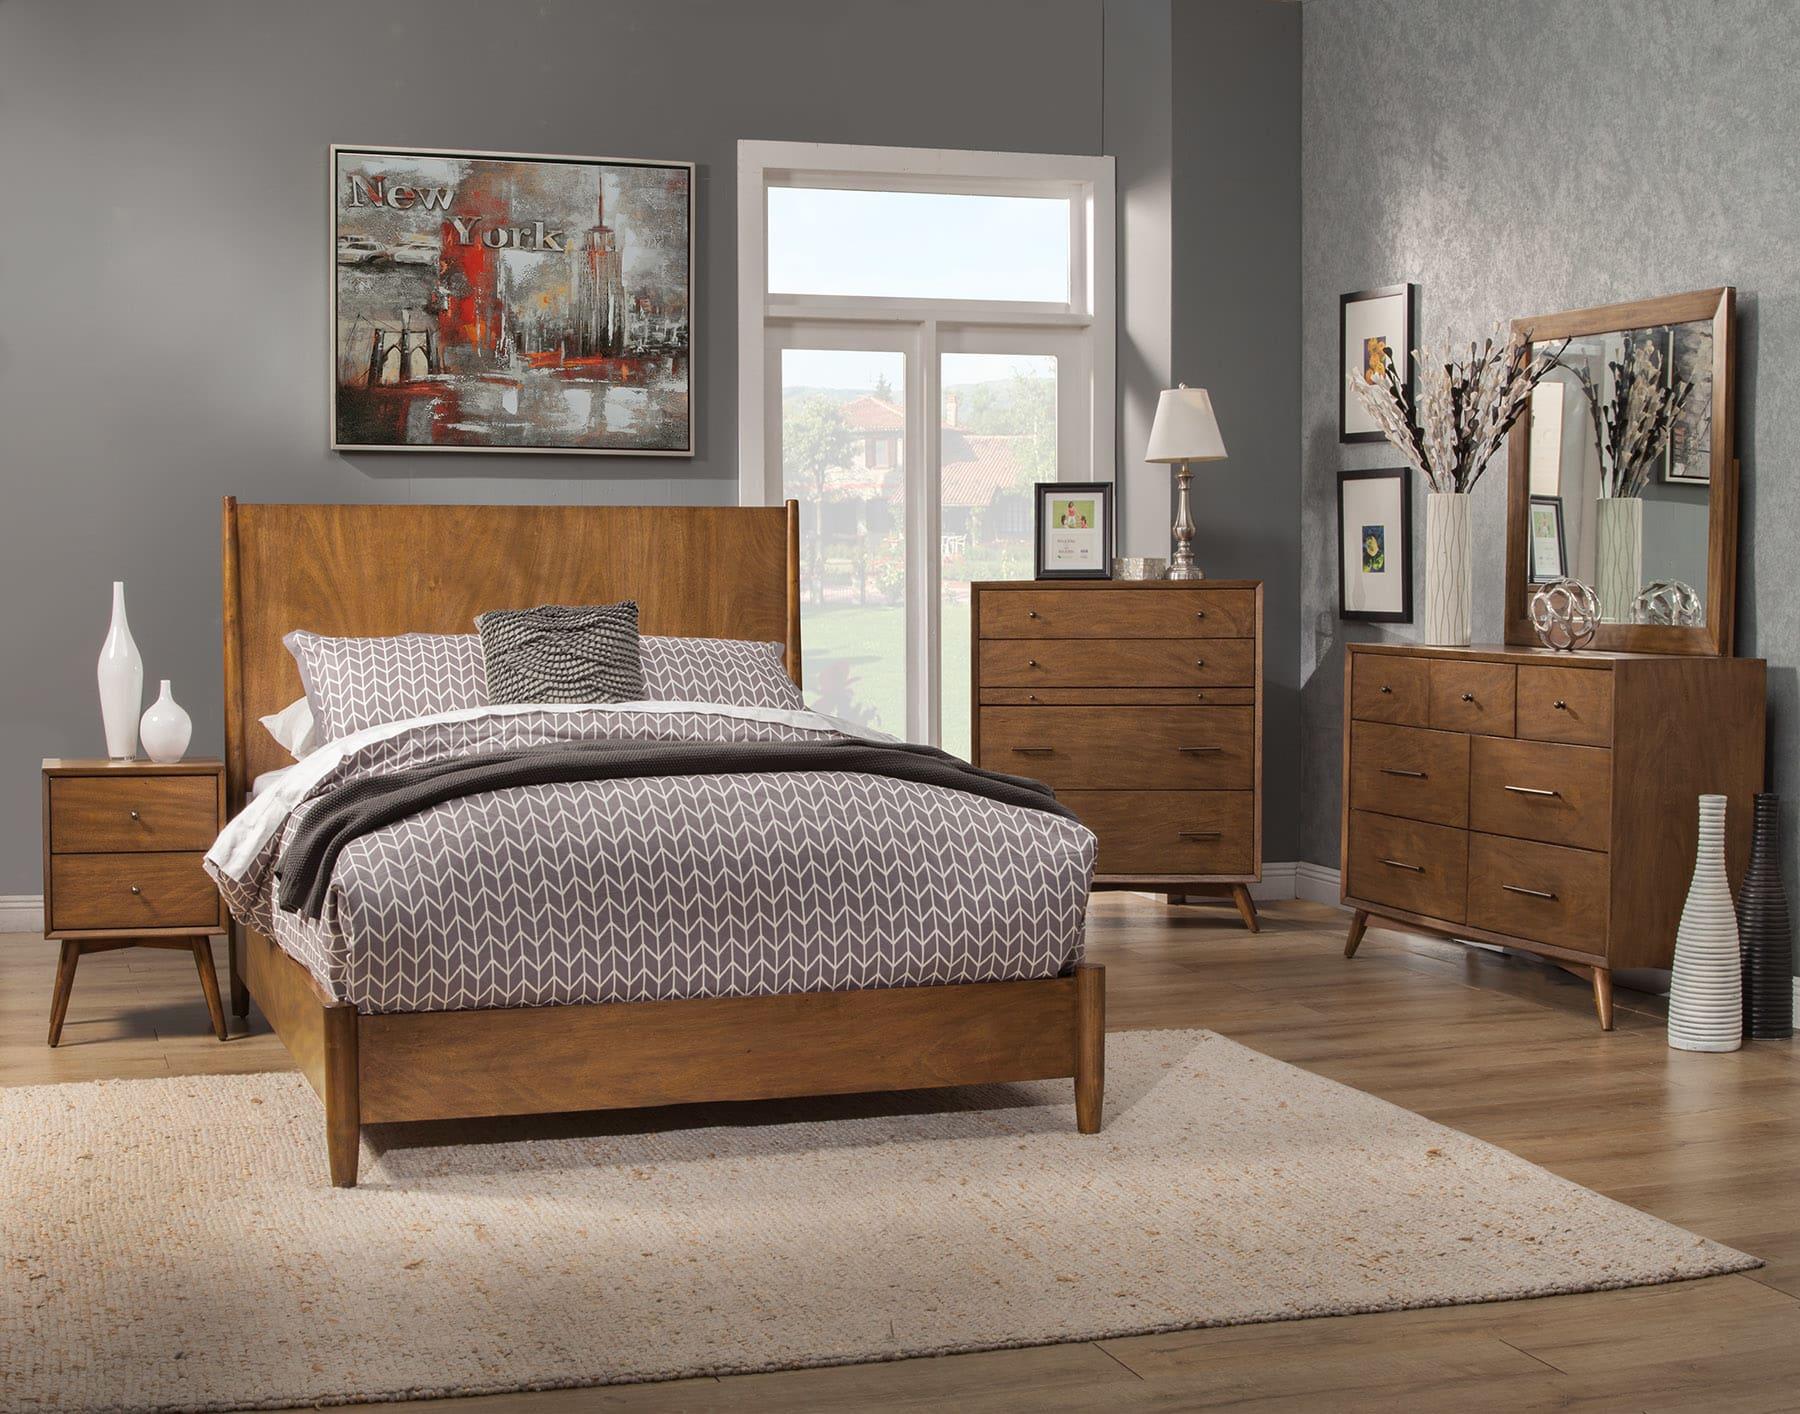 Alpine Flynn Acorn Mid Century Modern Queen 5 Piece Bedroom Set